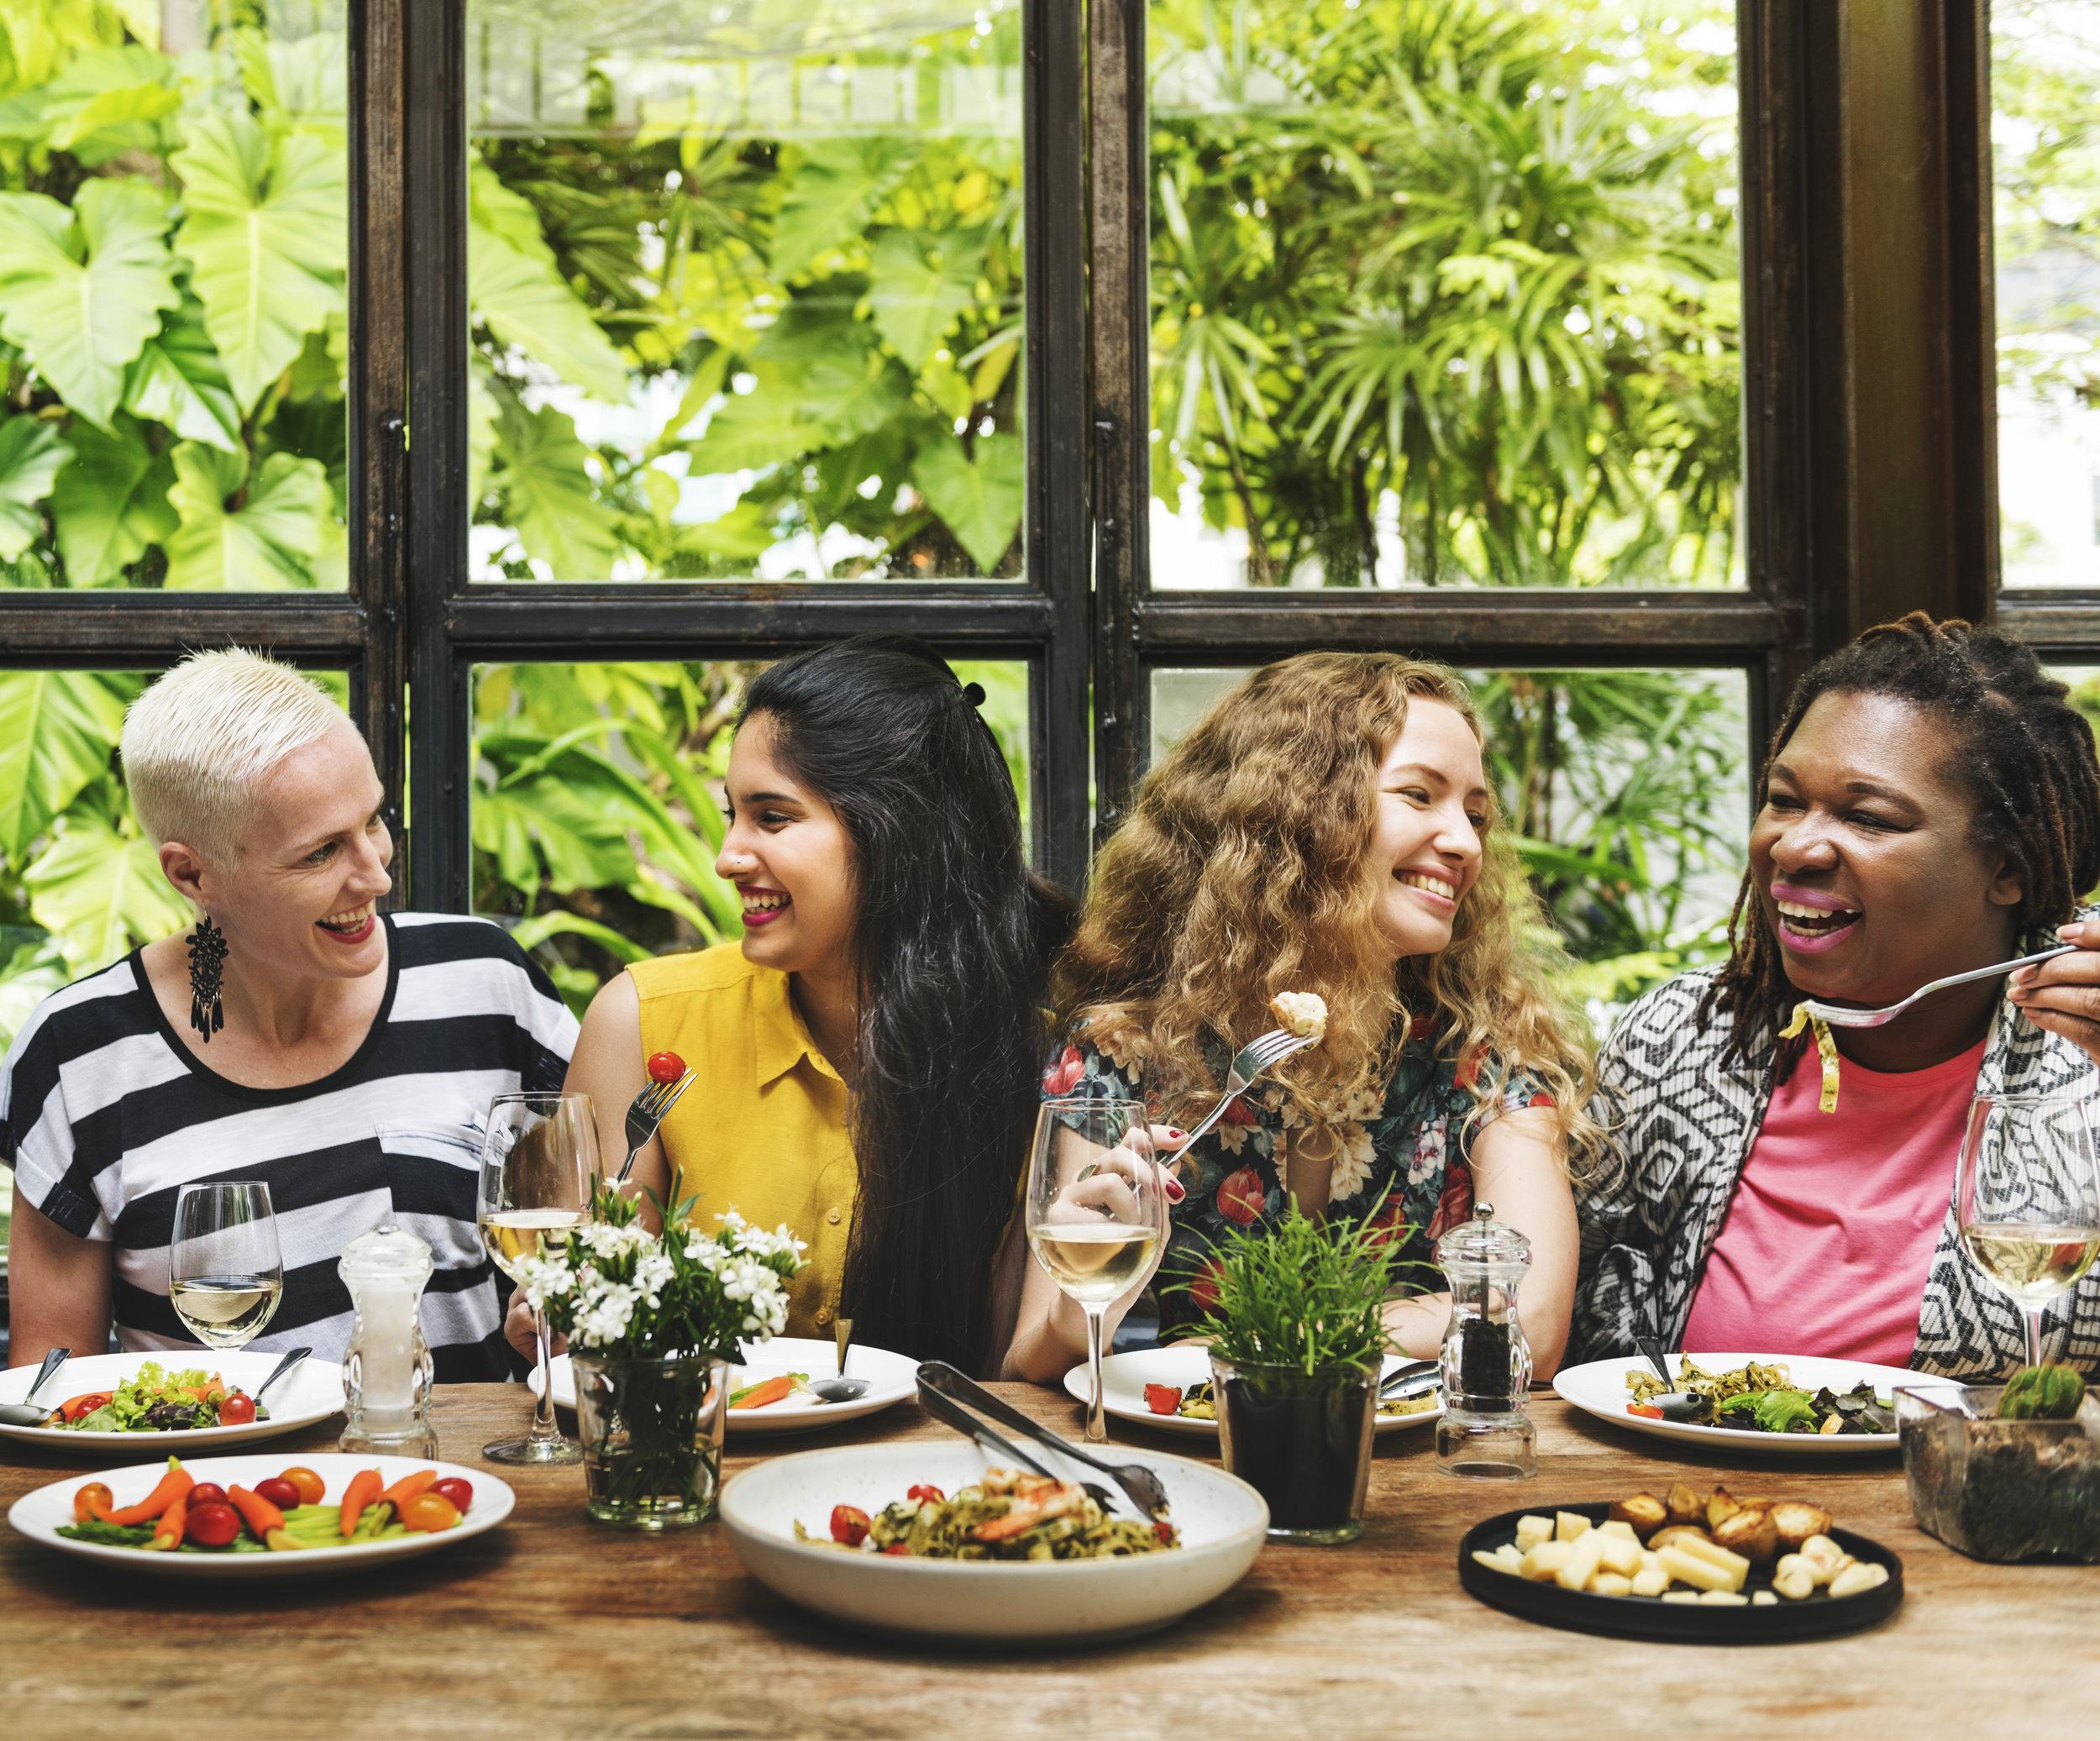 diversity-women-group-hanging-eating-together-P7D4NX3.jpg